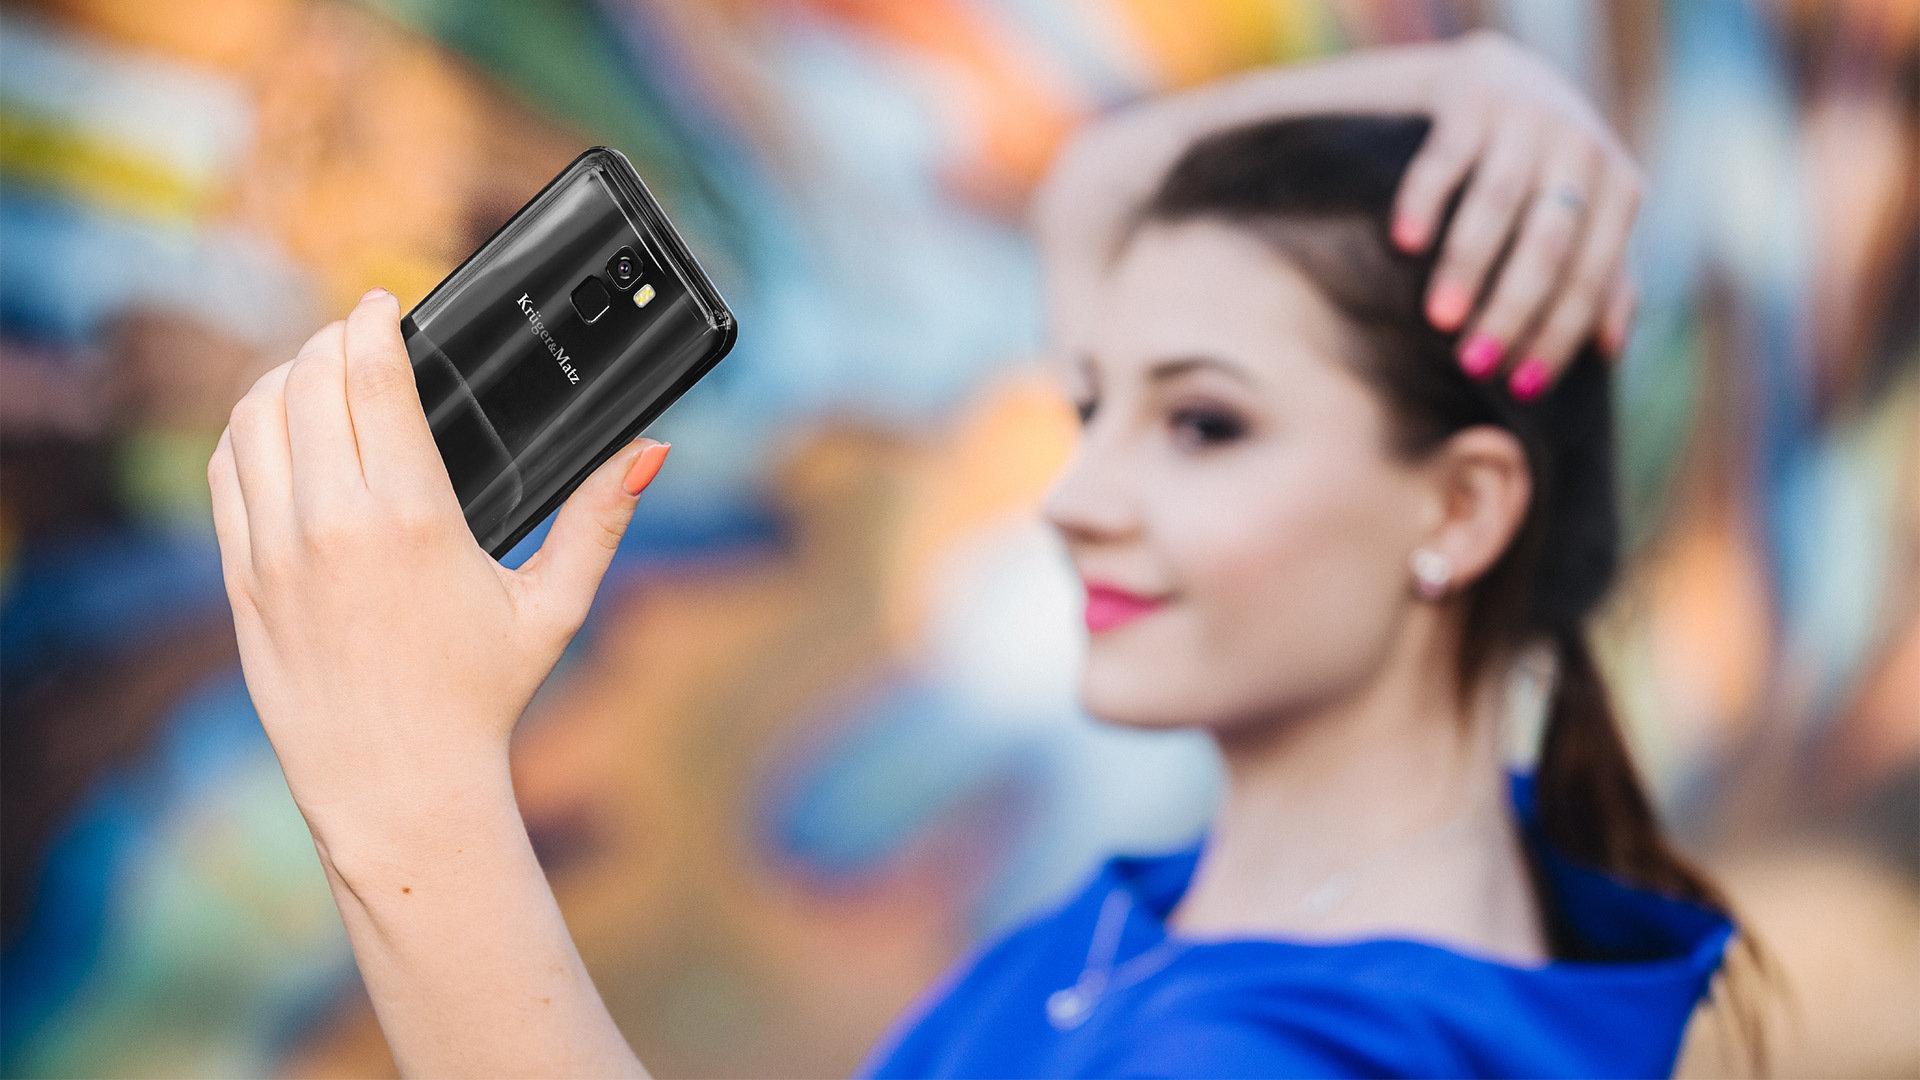 Nowy smartfon LIVE 6+ w ofercie Kruger&Matz